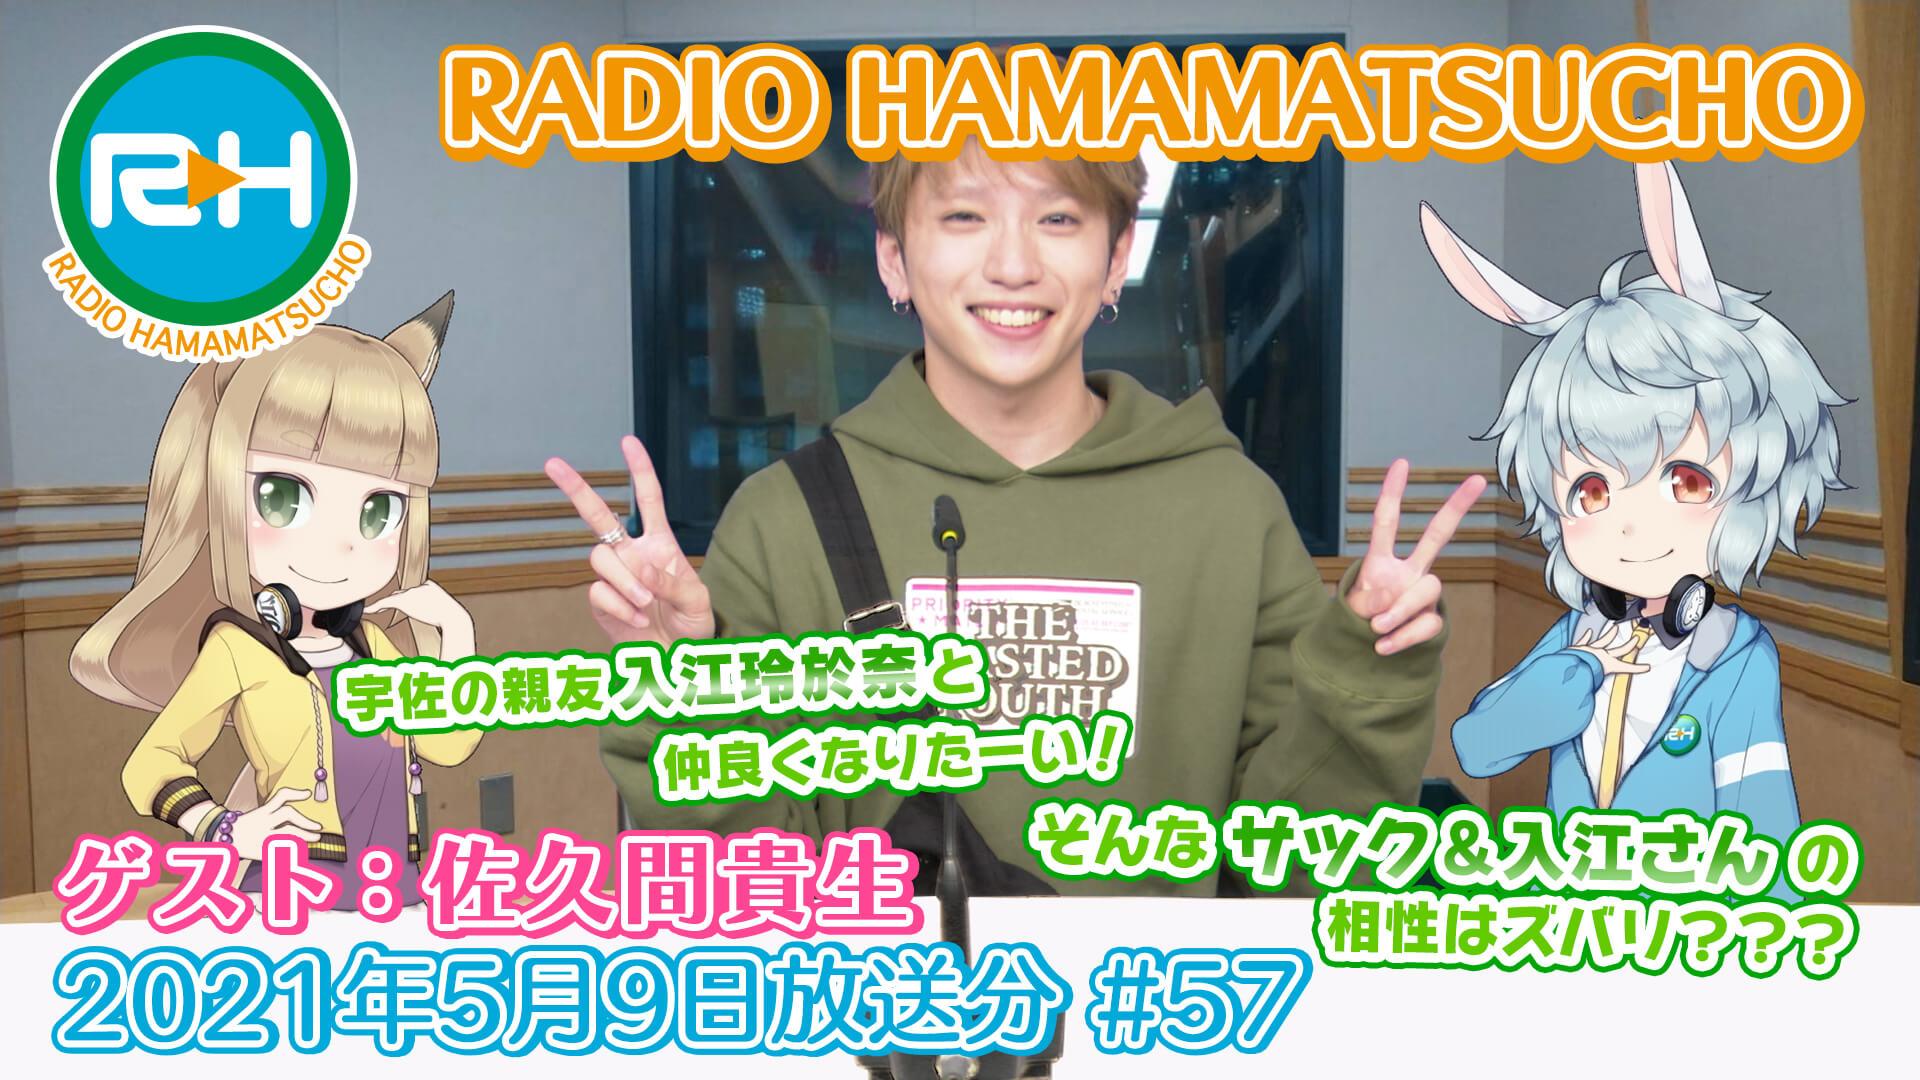 RADIO HAMAMATSUCHO 第57回 (2021年5月9日放送分) ゲスト: 佐久間貴生